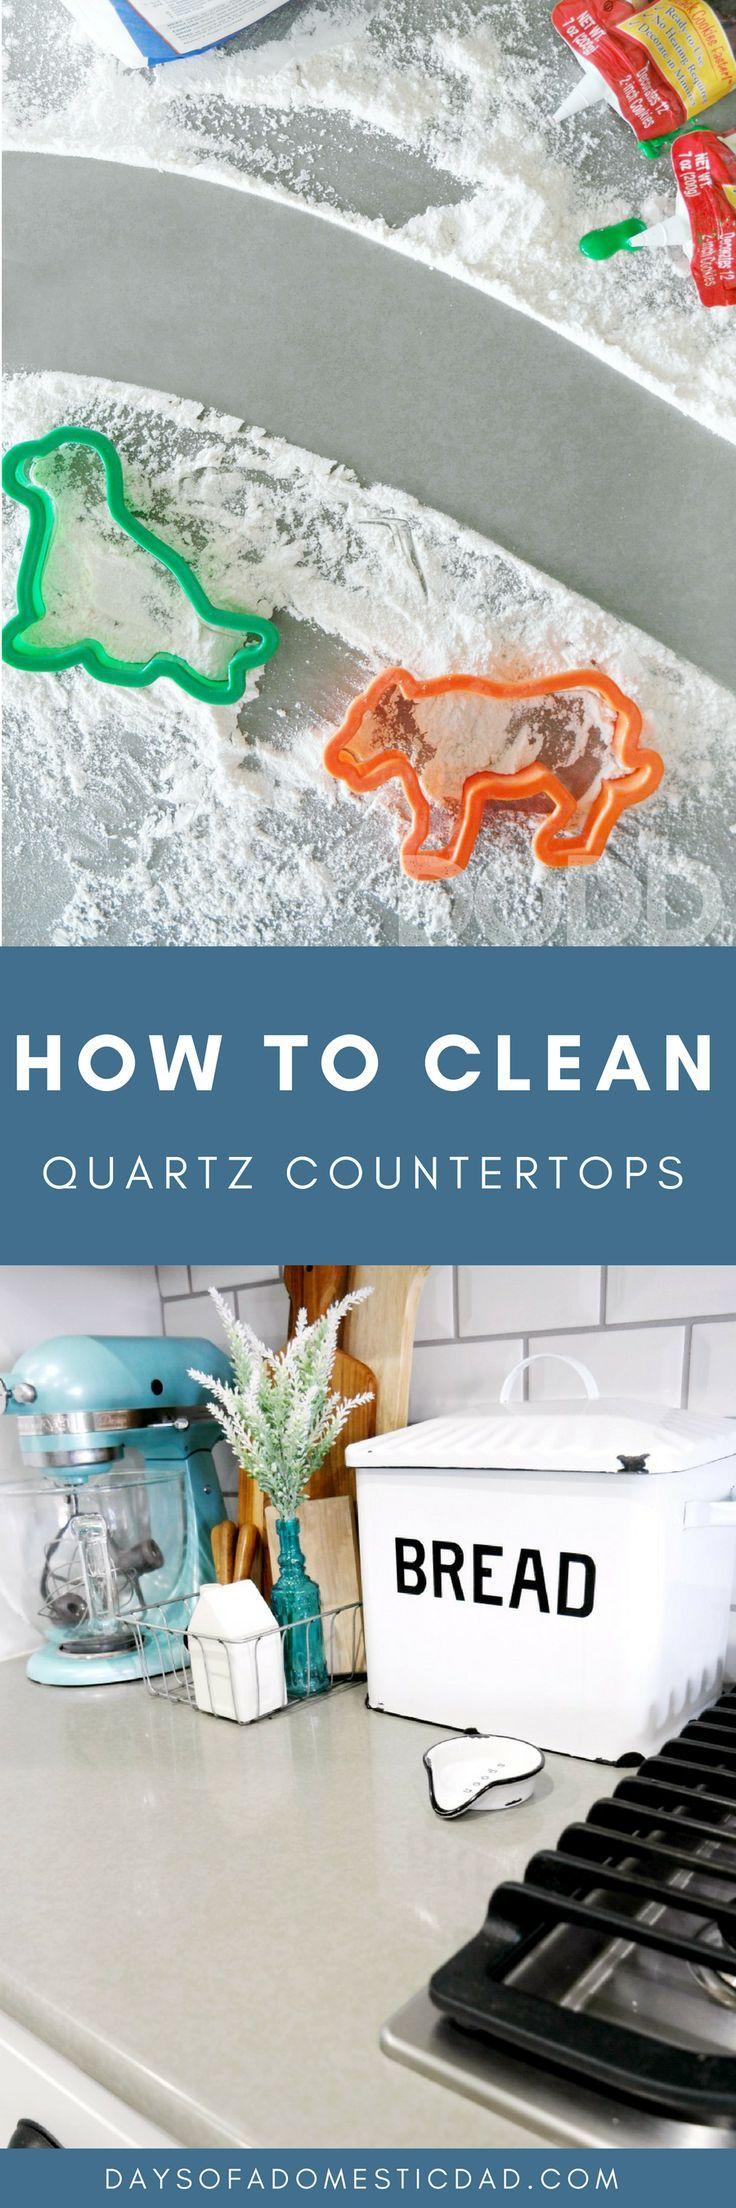 How to Clean Quartz Countertops How to clean quartz